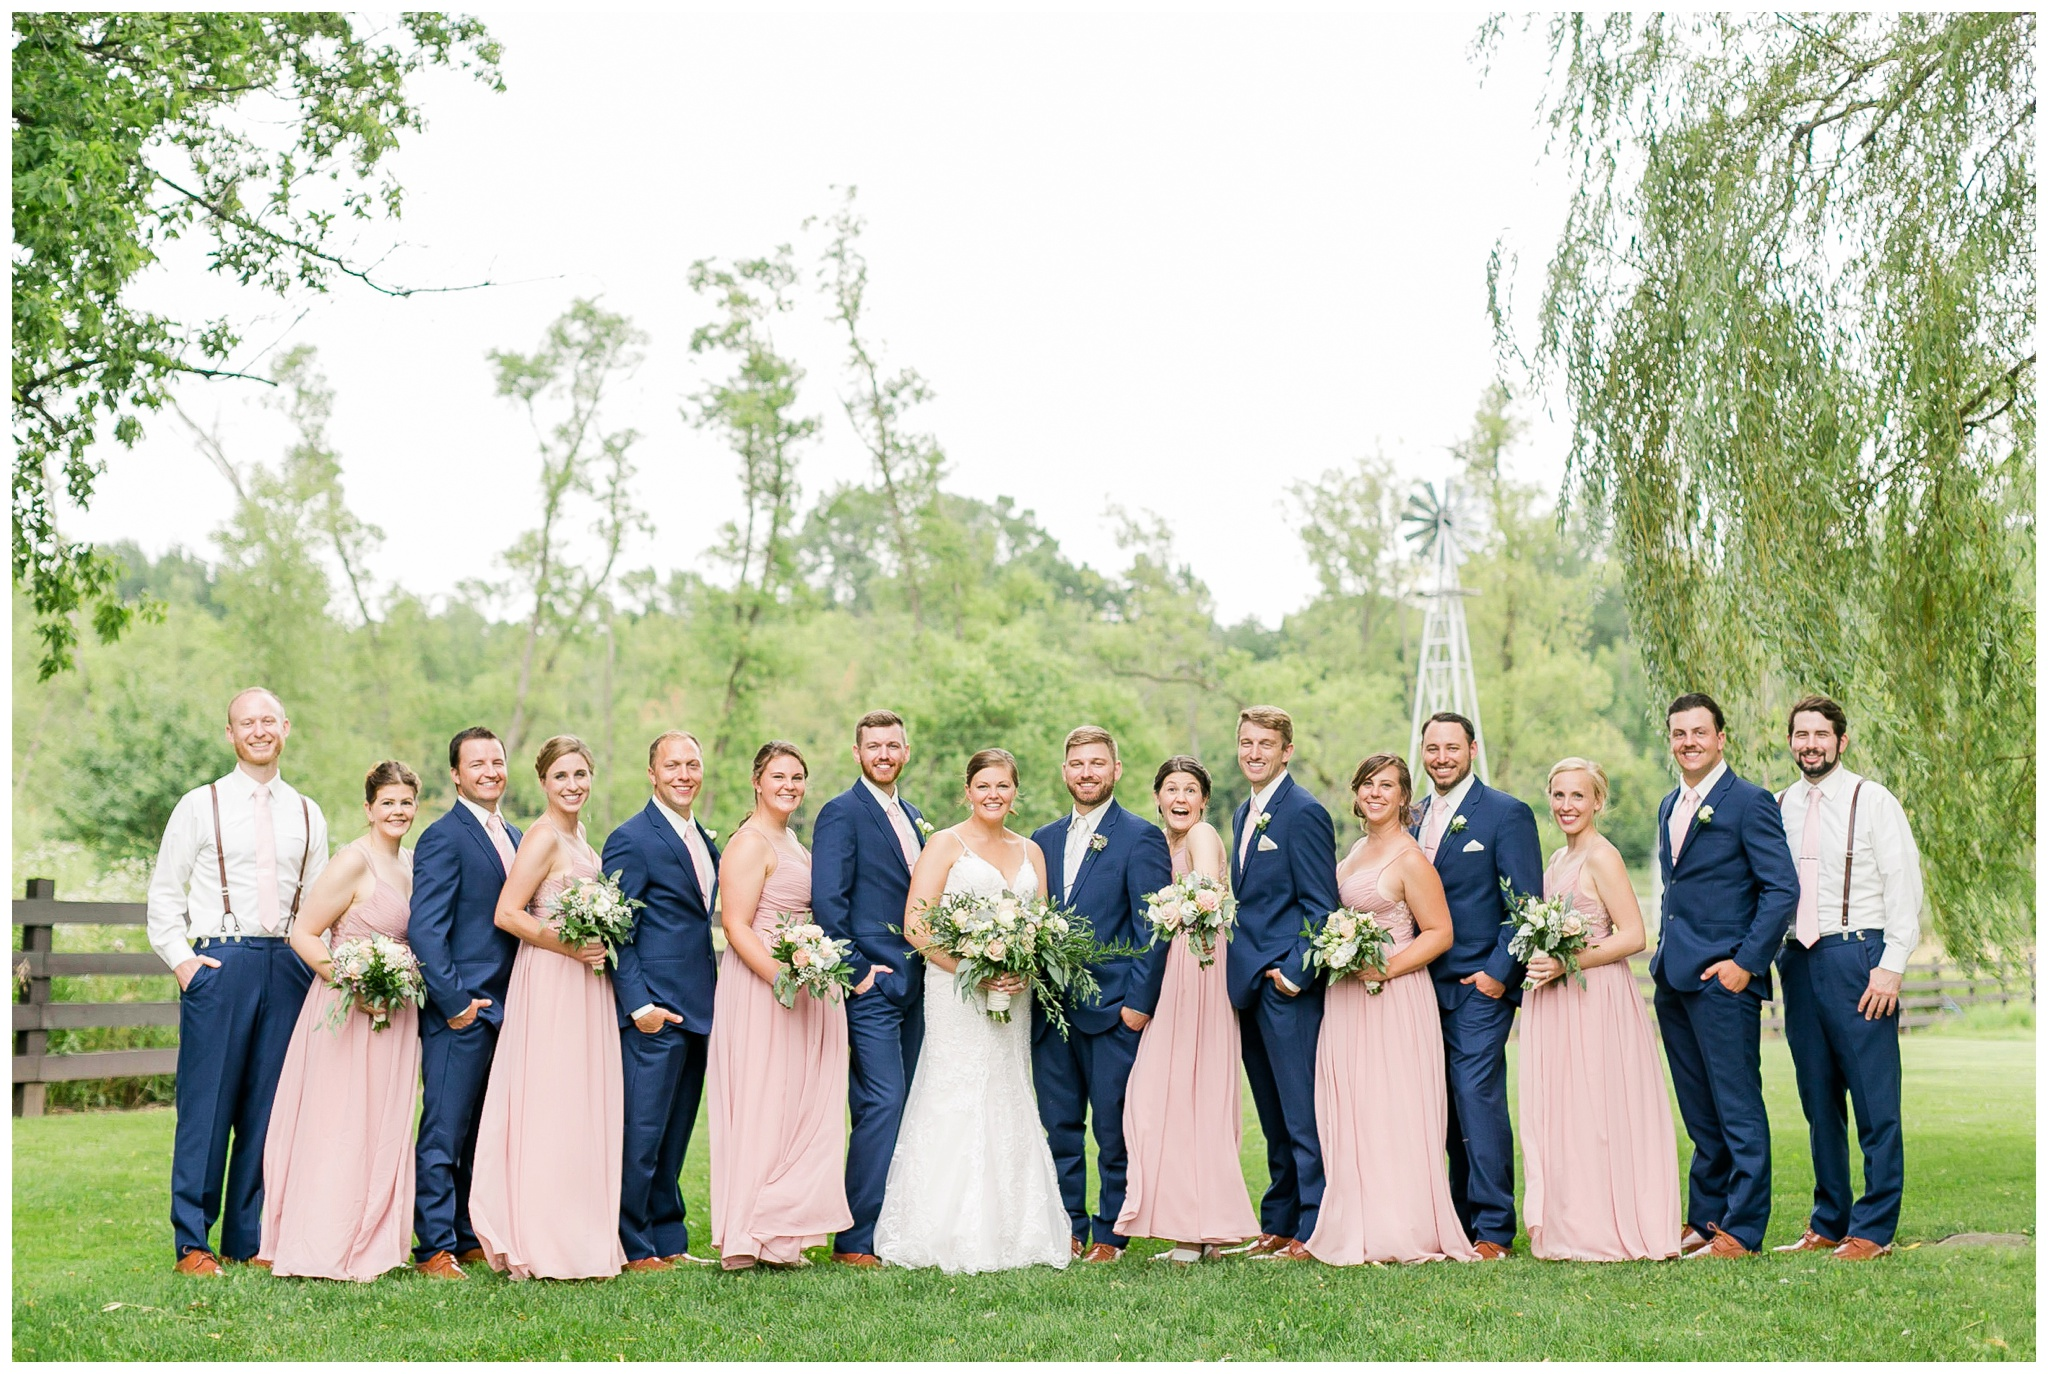 Barn_at_harvest_moon_pond_wedding_madison_wisconsin_wedding_photographers_3217.jpg